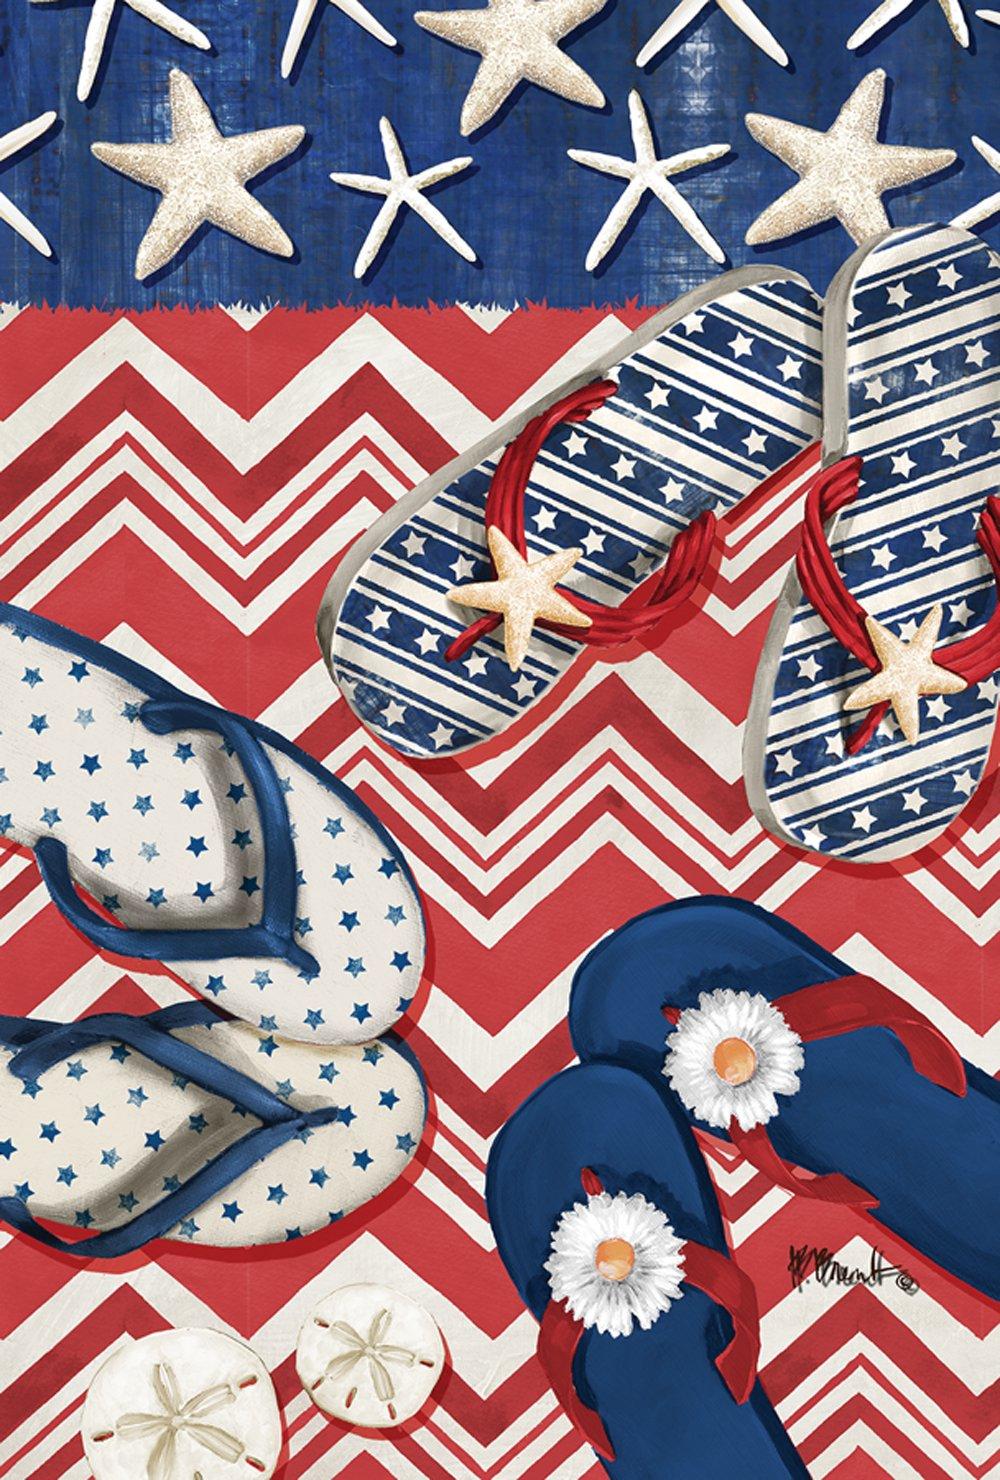 Toland Home Garden American Beach 28 x 40 Inch Decorative Patriotic Summer Sandal Flip Flop House Flag